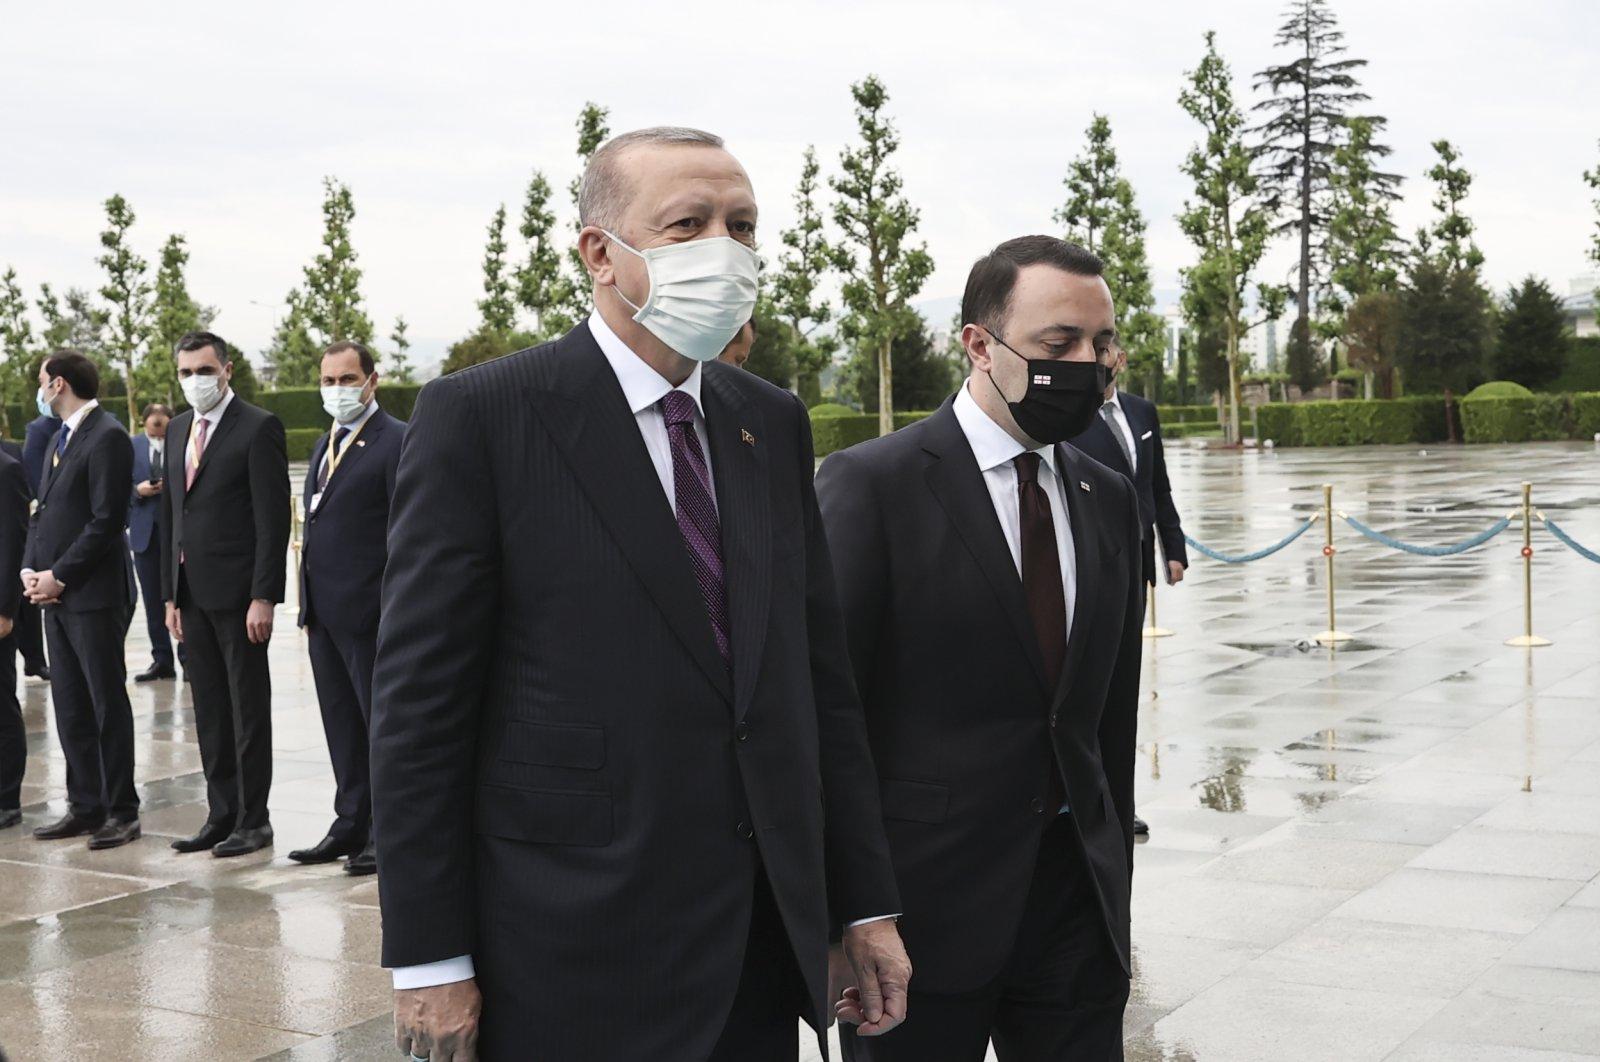 President Recep Tayyip Erdoğan (L) and Georgian Prime Minister Irakli Garibashvili walk towards the entrance at the Presidential Complex, Ankara, Turkey, June 1, 2021. (AA Photo)